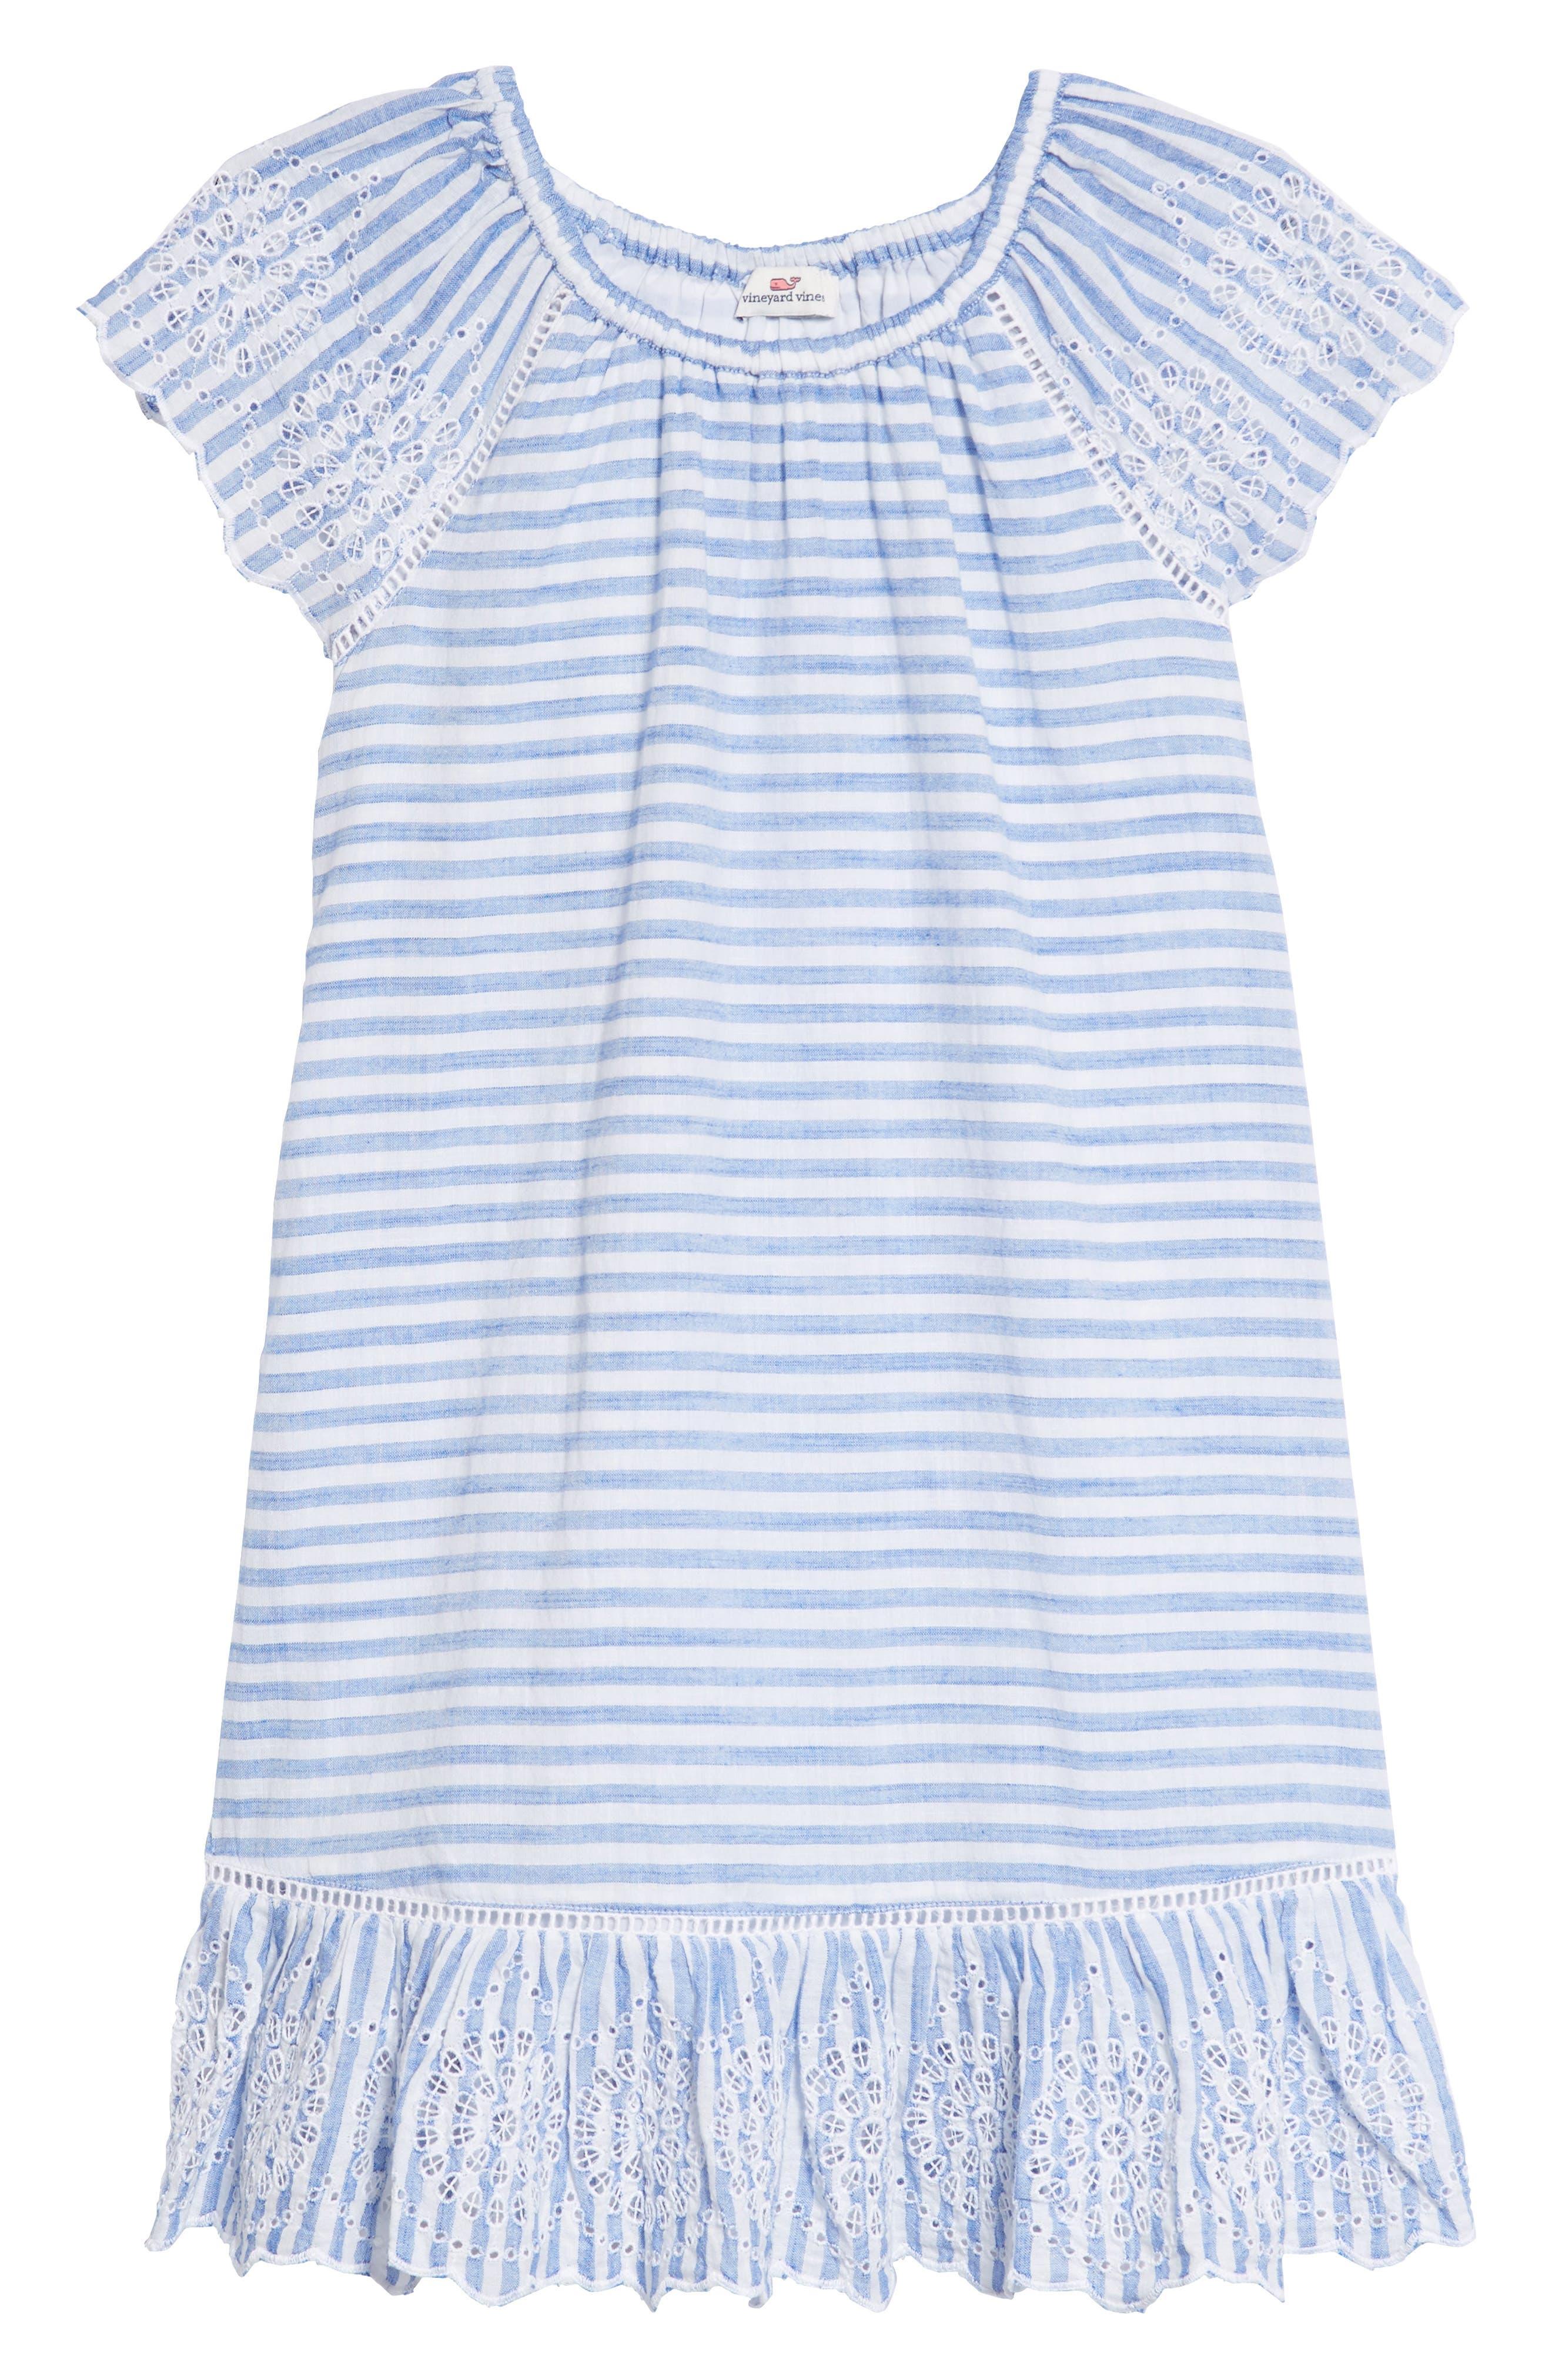 Main Image - vineyard vines Stripe Eyelet Dress (Little Girls & Big Girls)